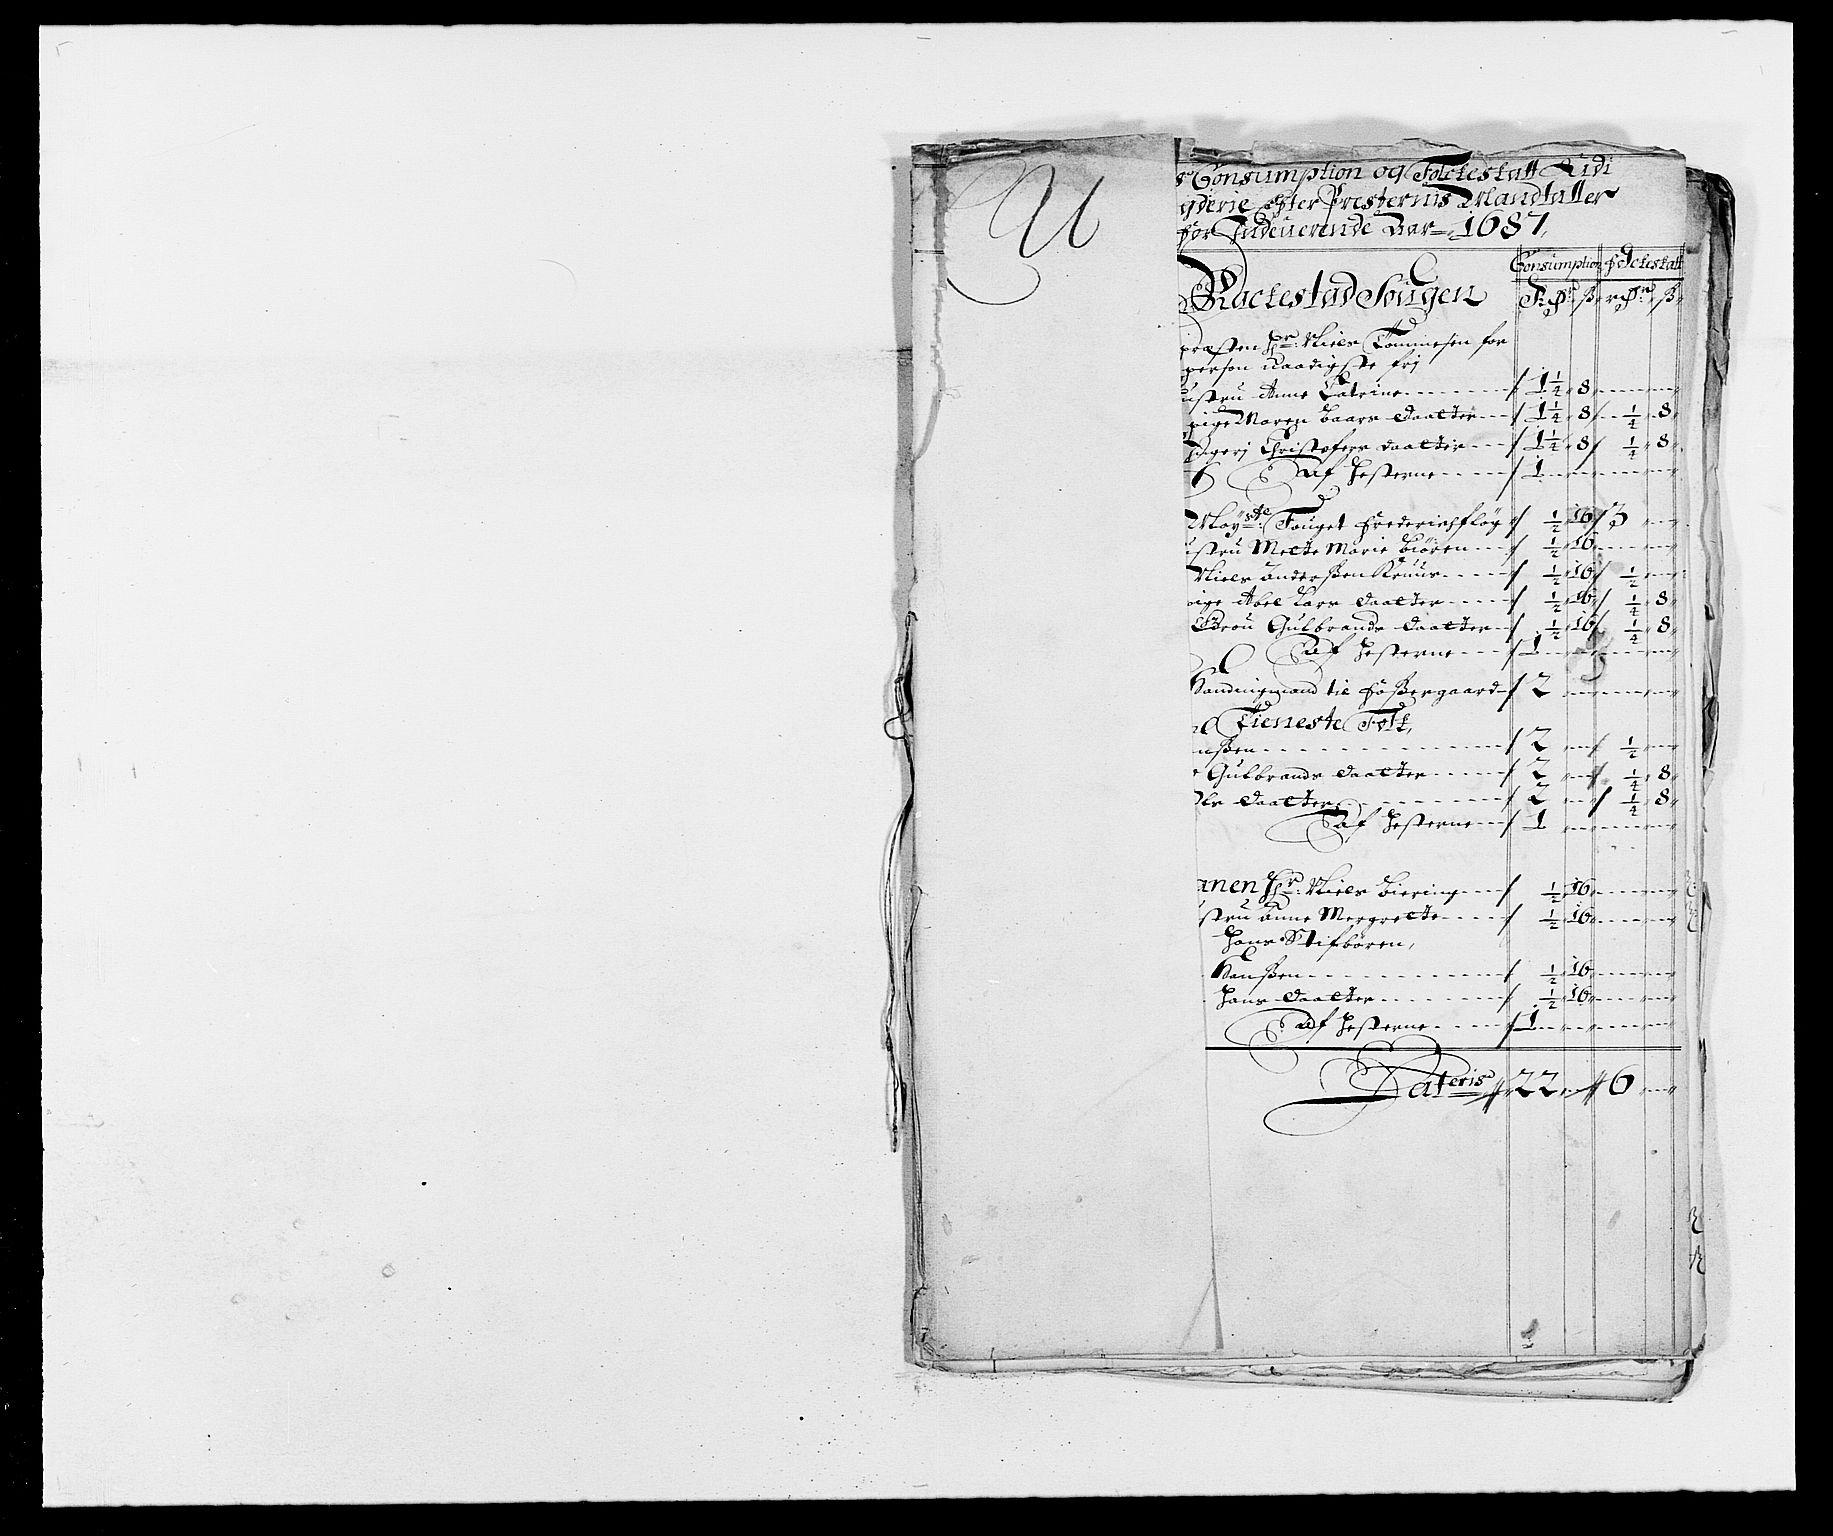 RA, Rentekammeret inntil 1814, Reviderte regnskaper, Fogderegnskap, R05/L0276: Fogderegnskap Rakkestad, 1683-1688, s. 90